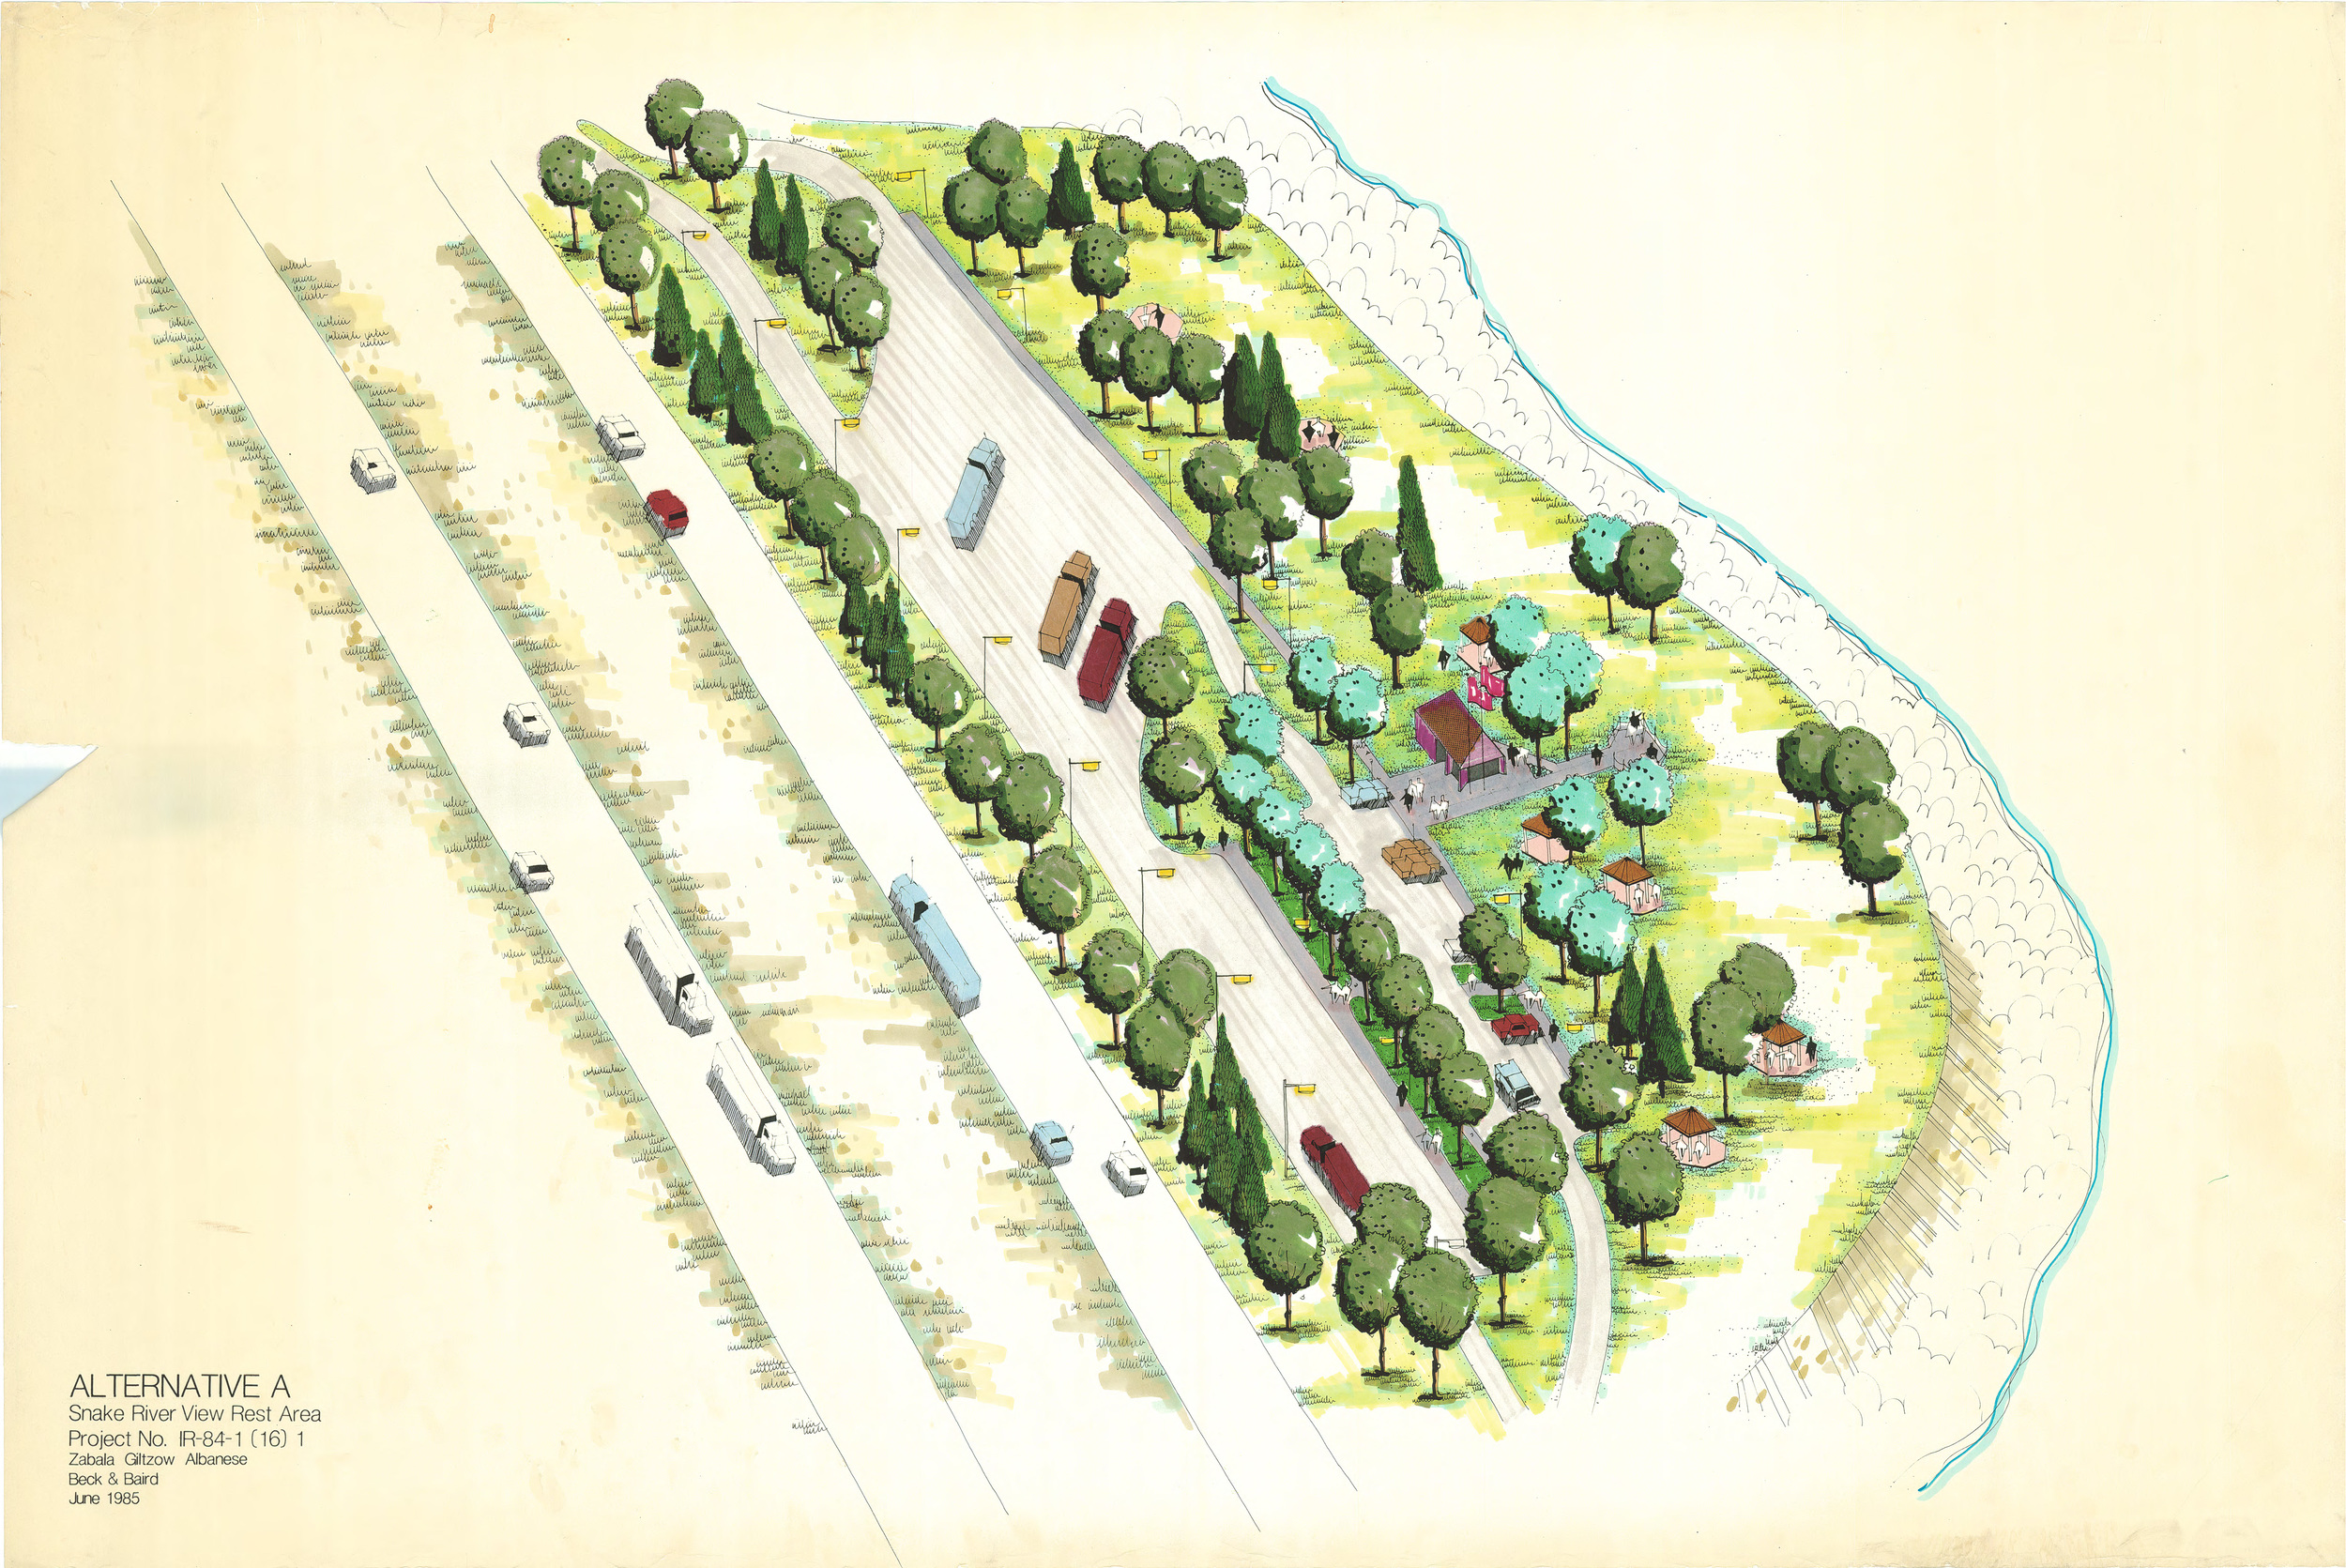 Beck&Baird Snake River RA Iso_Low Resolution.jpg